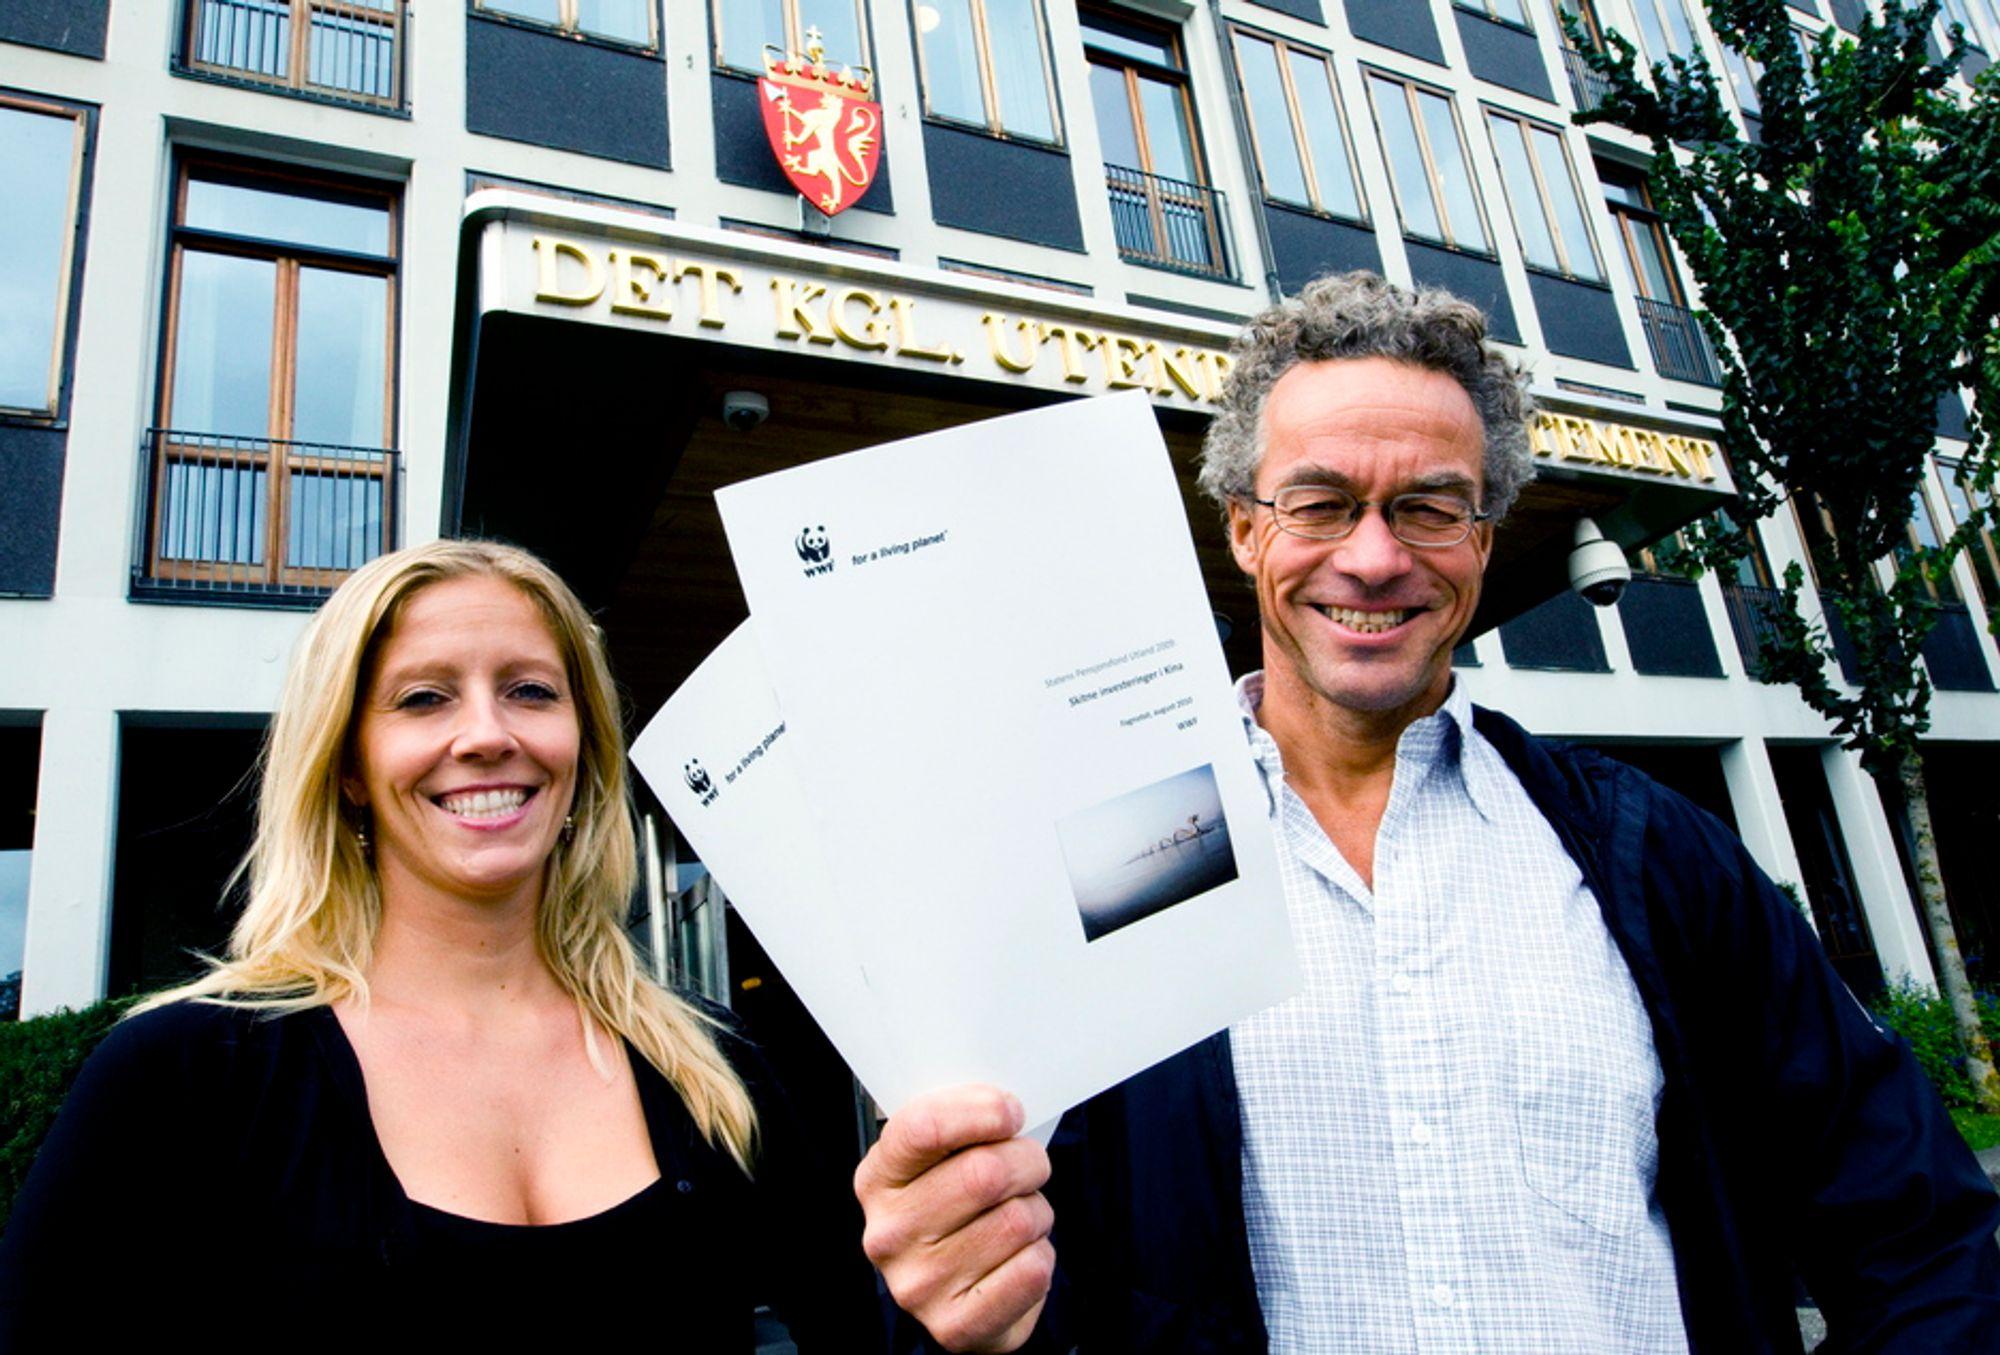 Nina Jensen overtar for Rasmus Hansson som generalsekretær i WWF-Norge. Her da de overleverte en rapport om miljøvernhensyn de ikke mener norske myndigheter tar når oljefondet investerer i Kina.